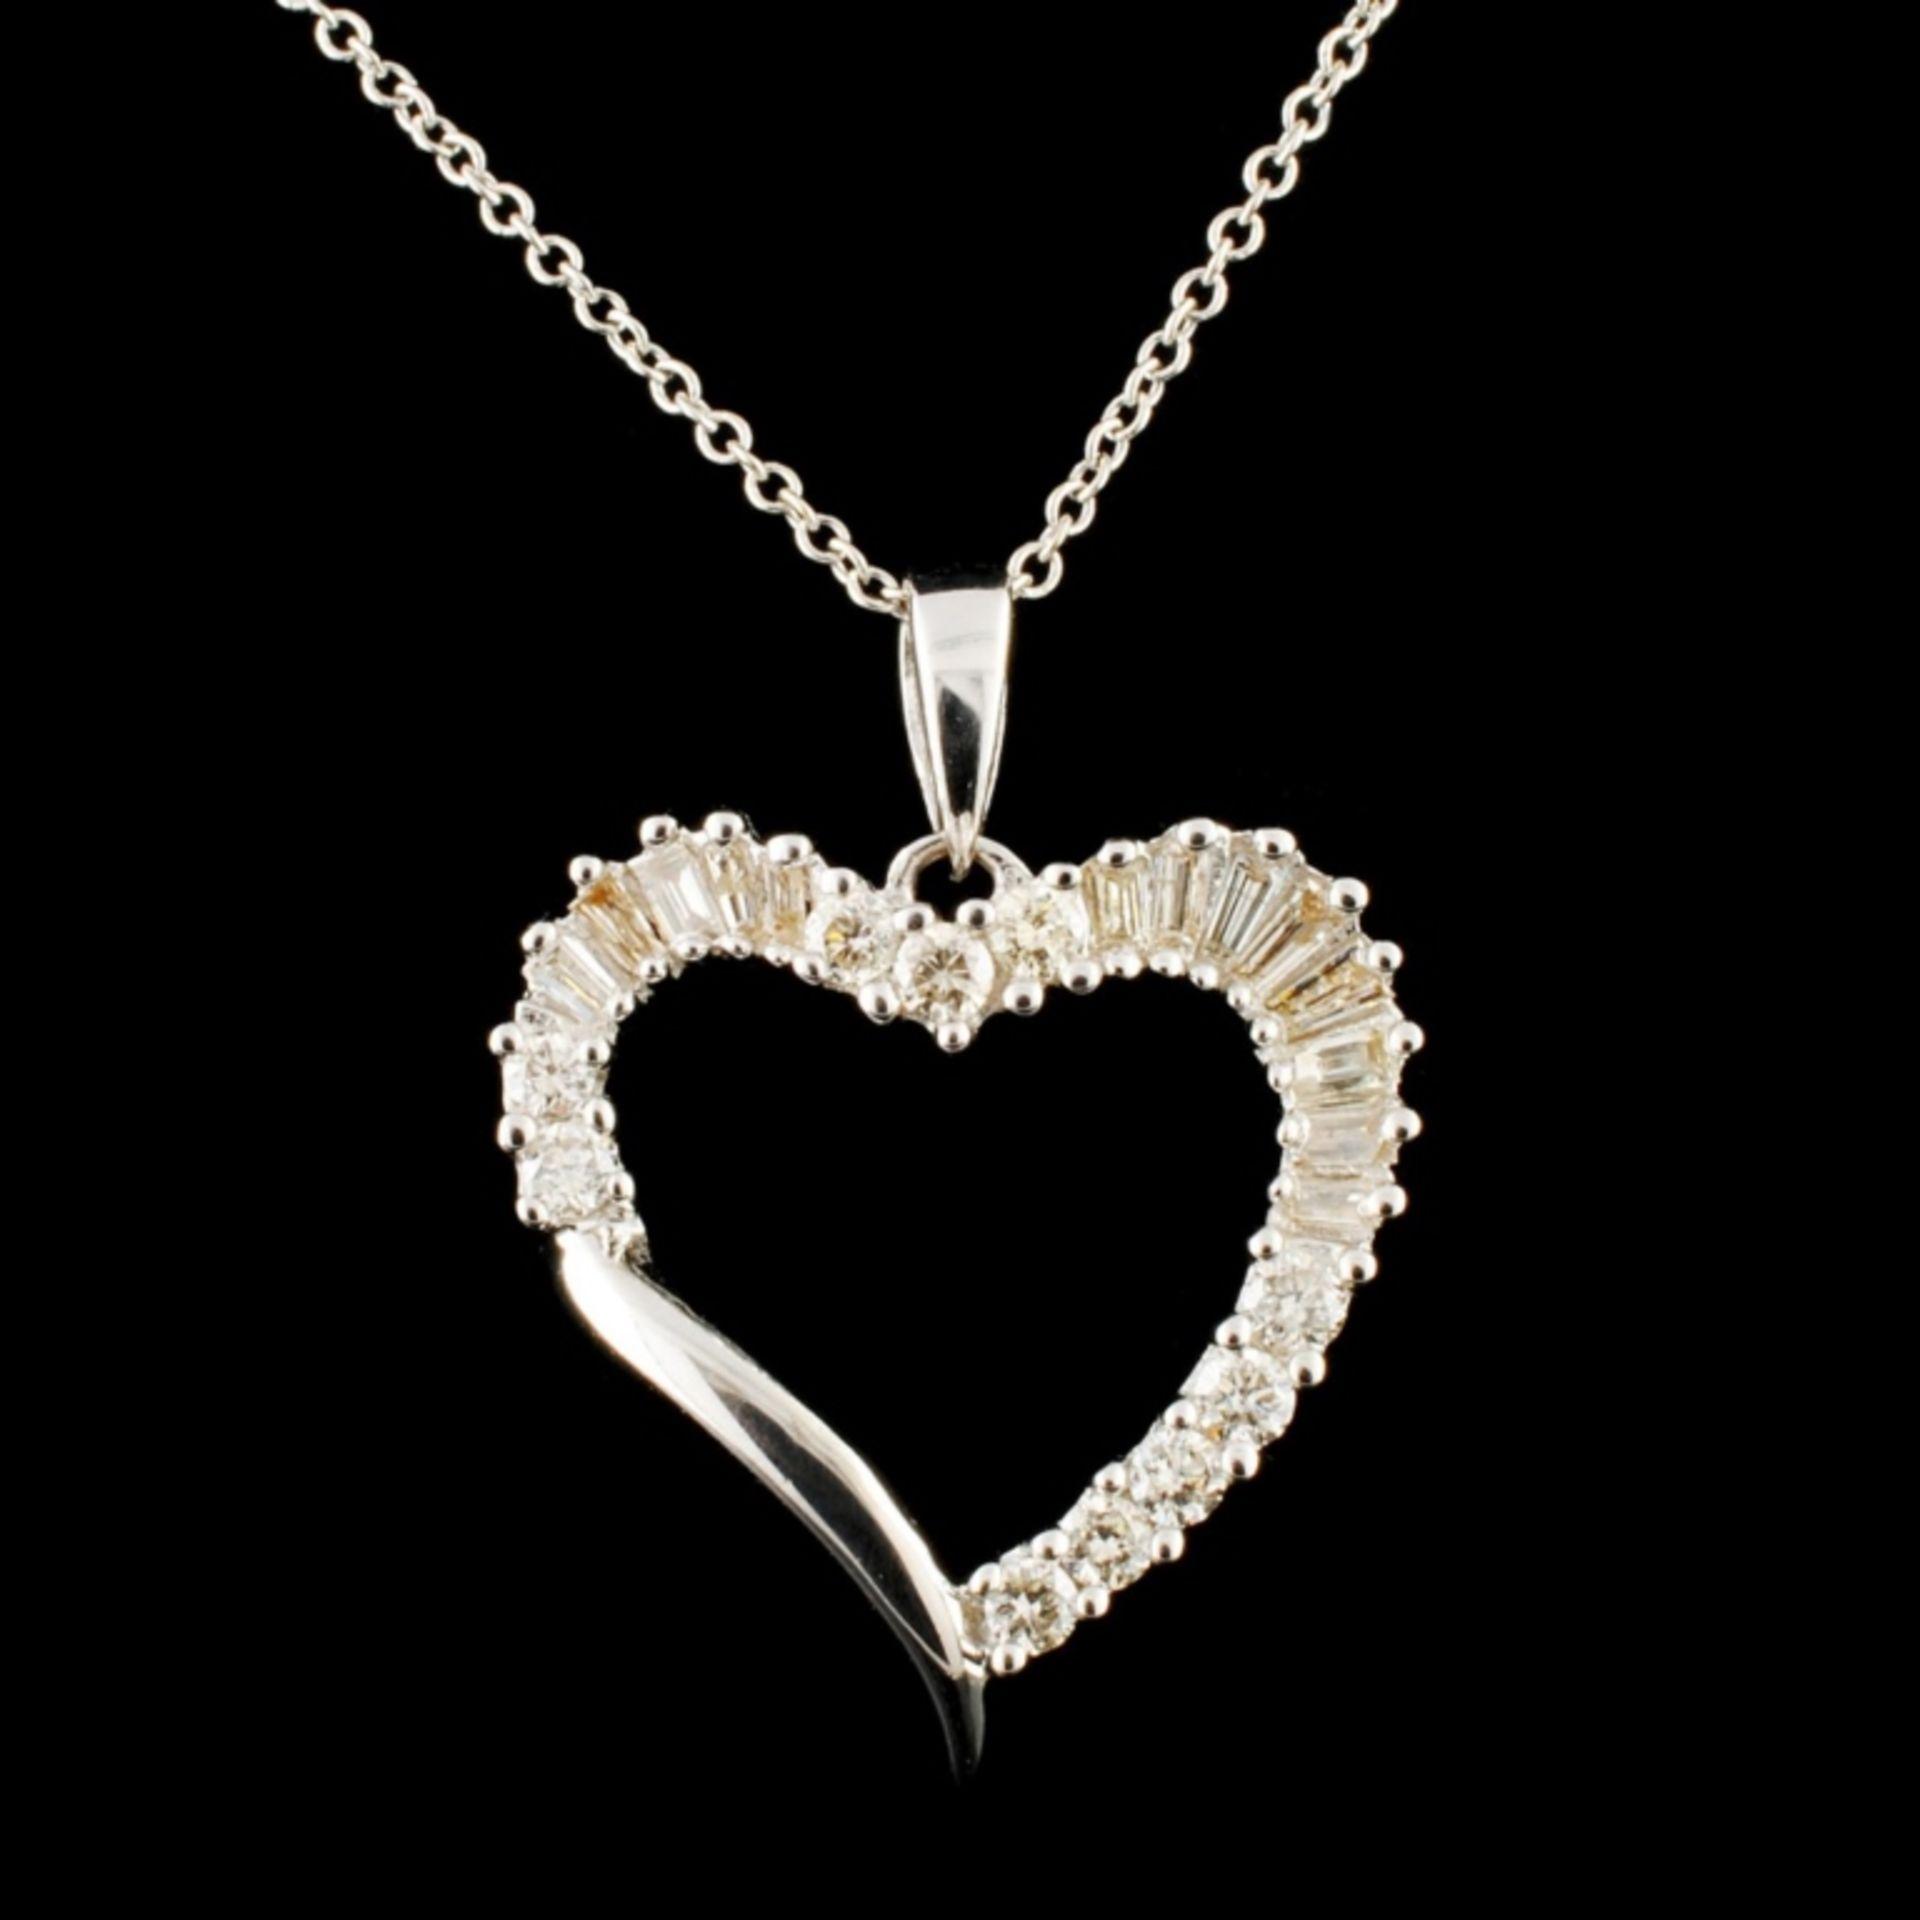 14K Gold 0.45ctw Diamond Pendant